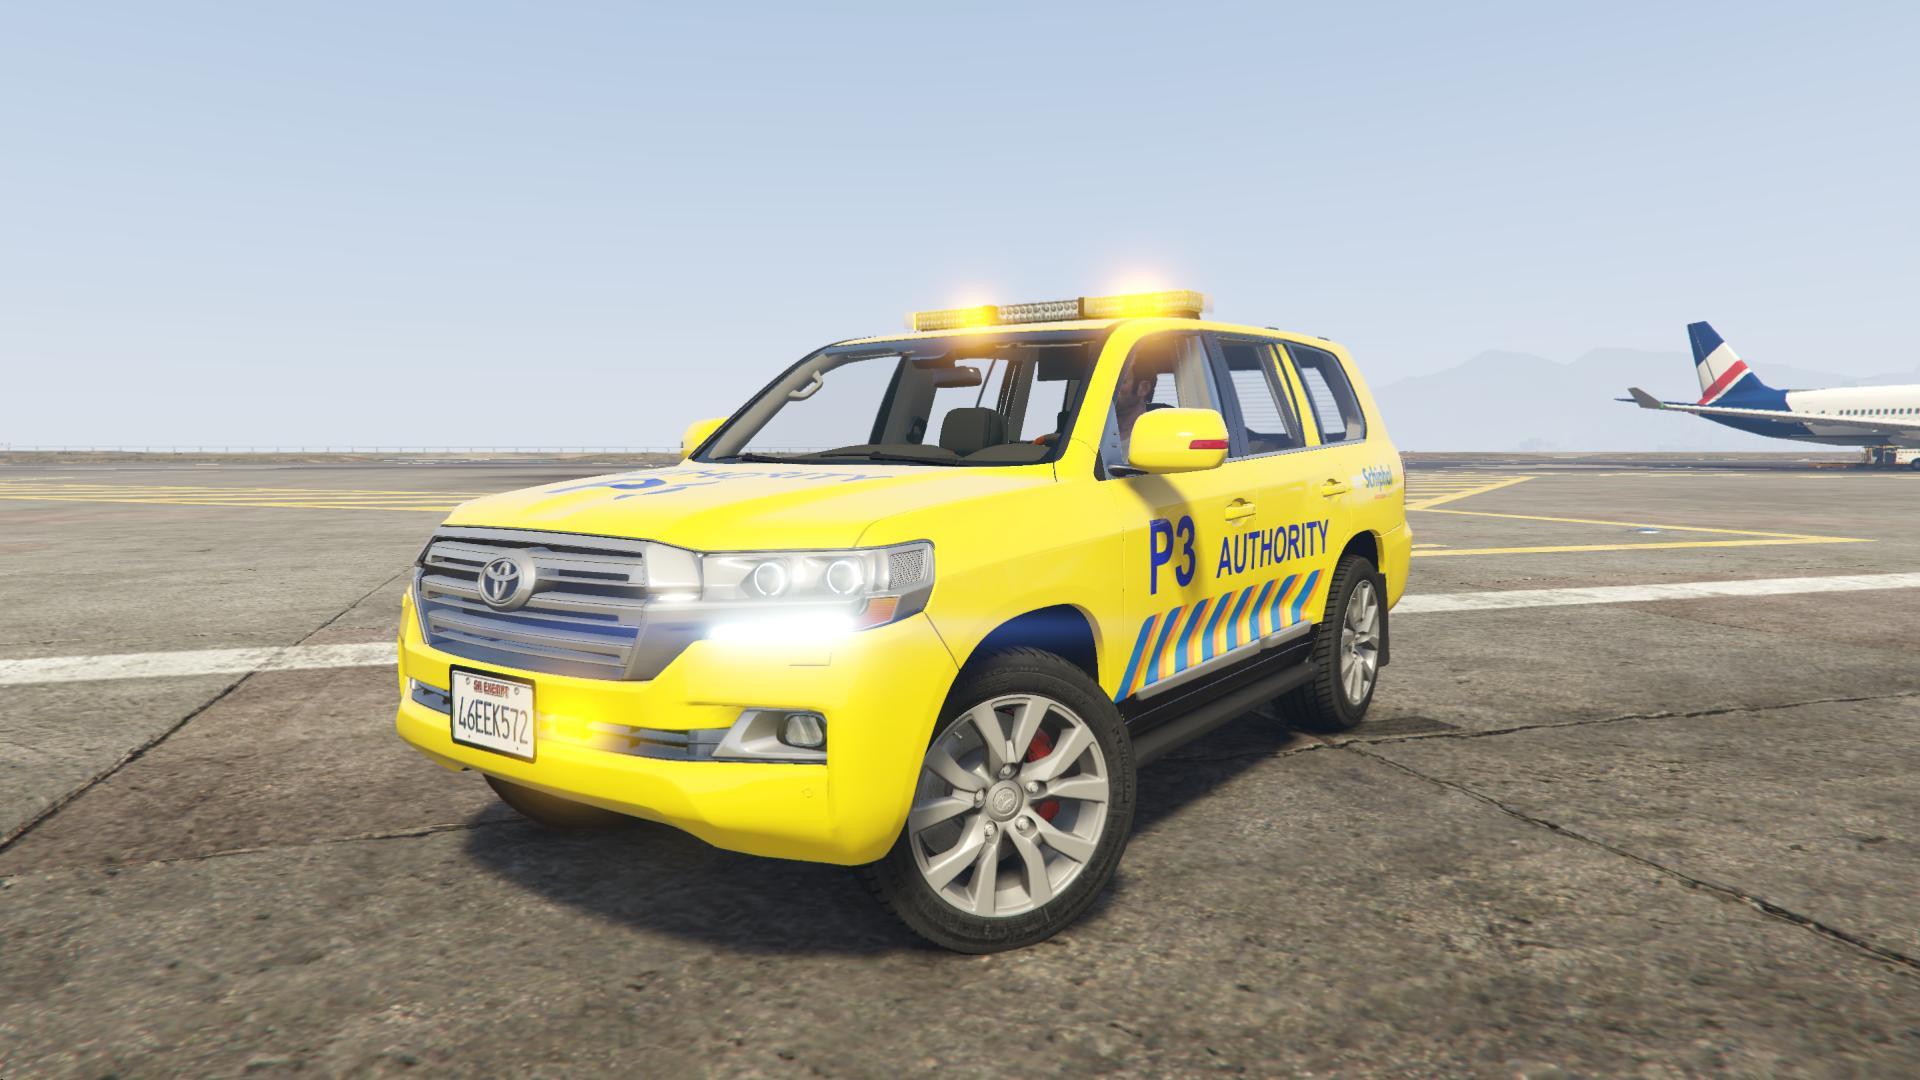 Toyota Land Cruiser Airport Authority Gta5 Mods Com